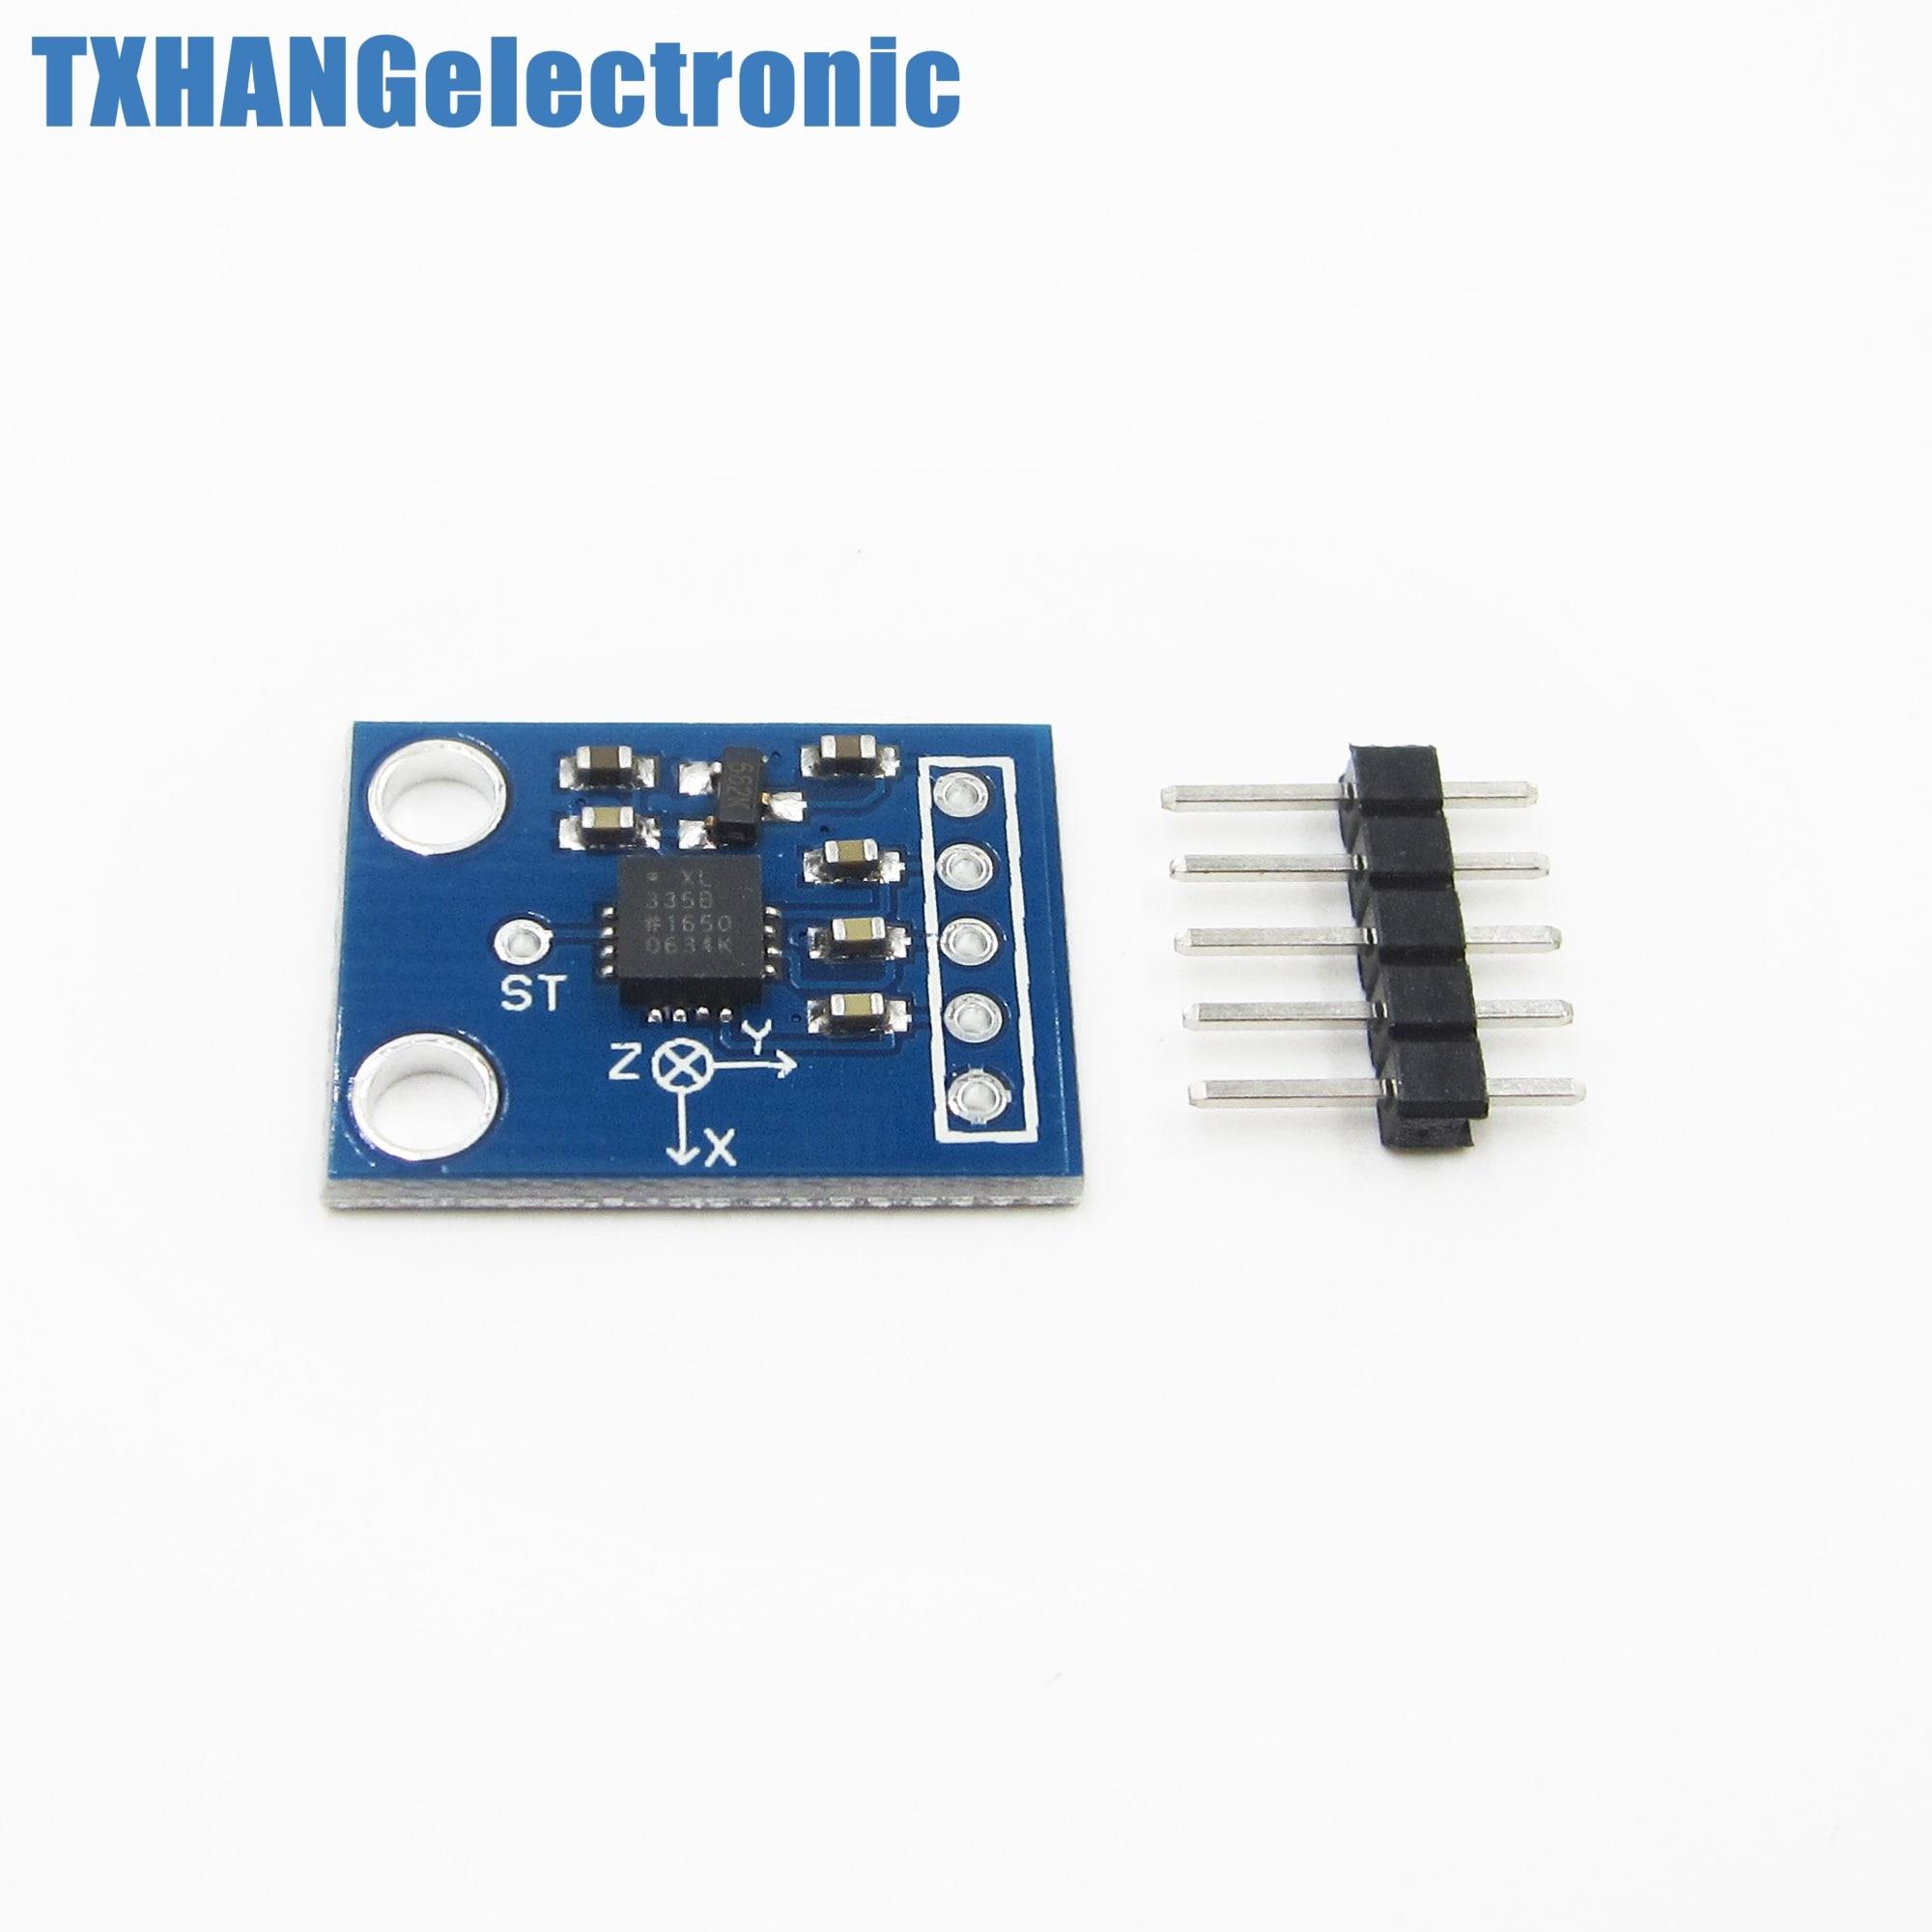 10 Uds. ADXL335 módulo de acelerómetro de salida de 3 ejes transductor angular diy electronics